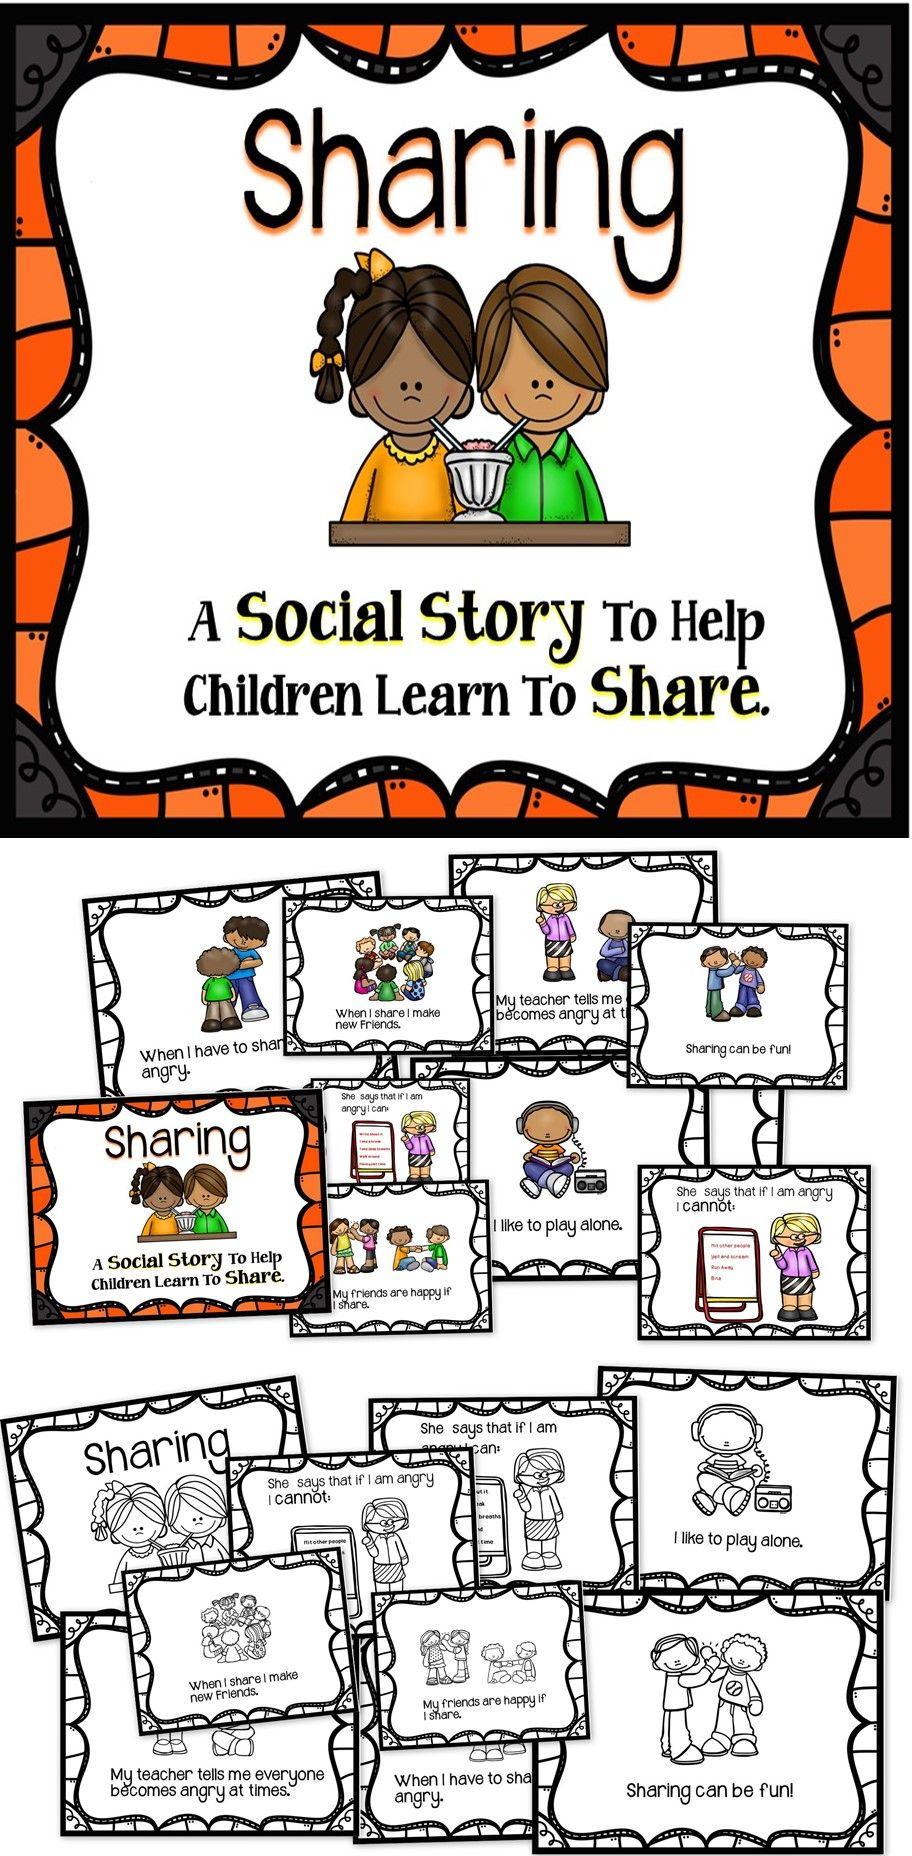 5 Social Skills Games For Children of All Ages - Udemy Blog